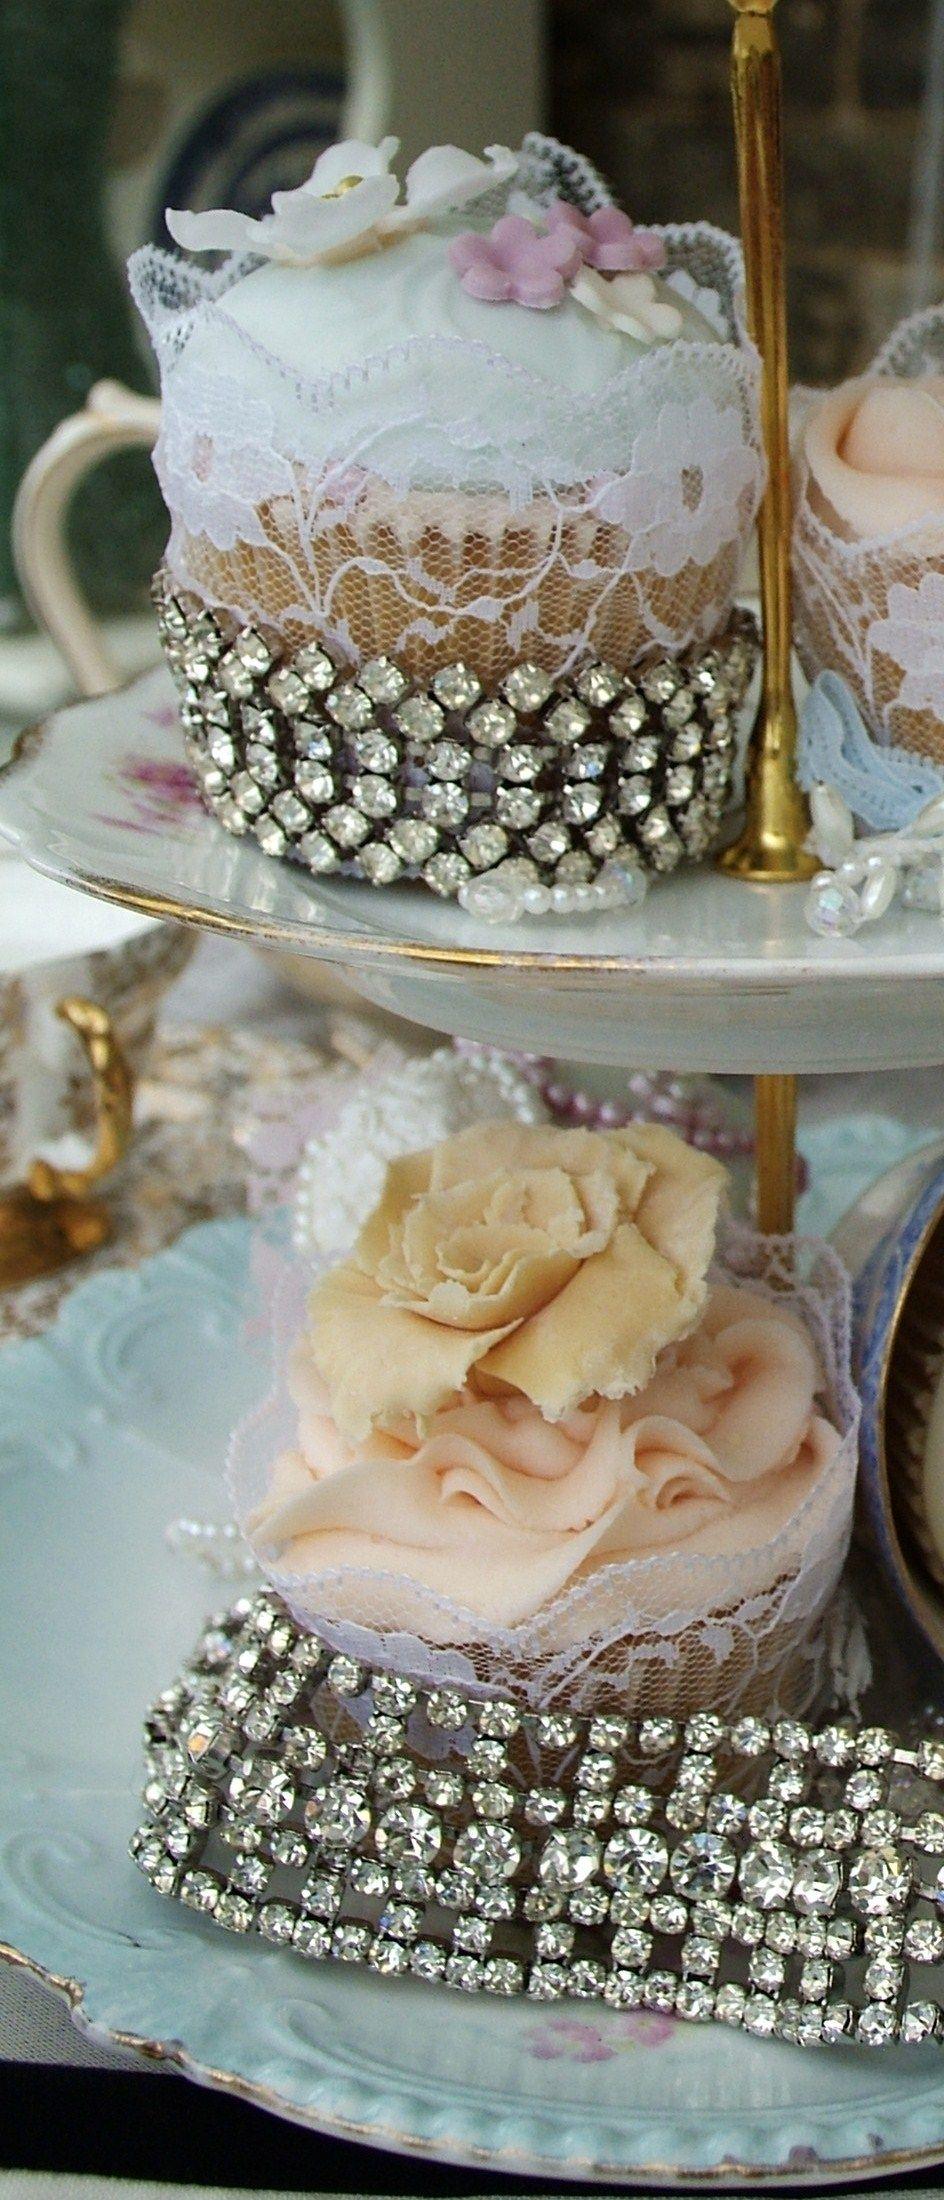 Vintage cup cakes